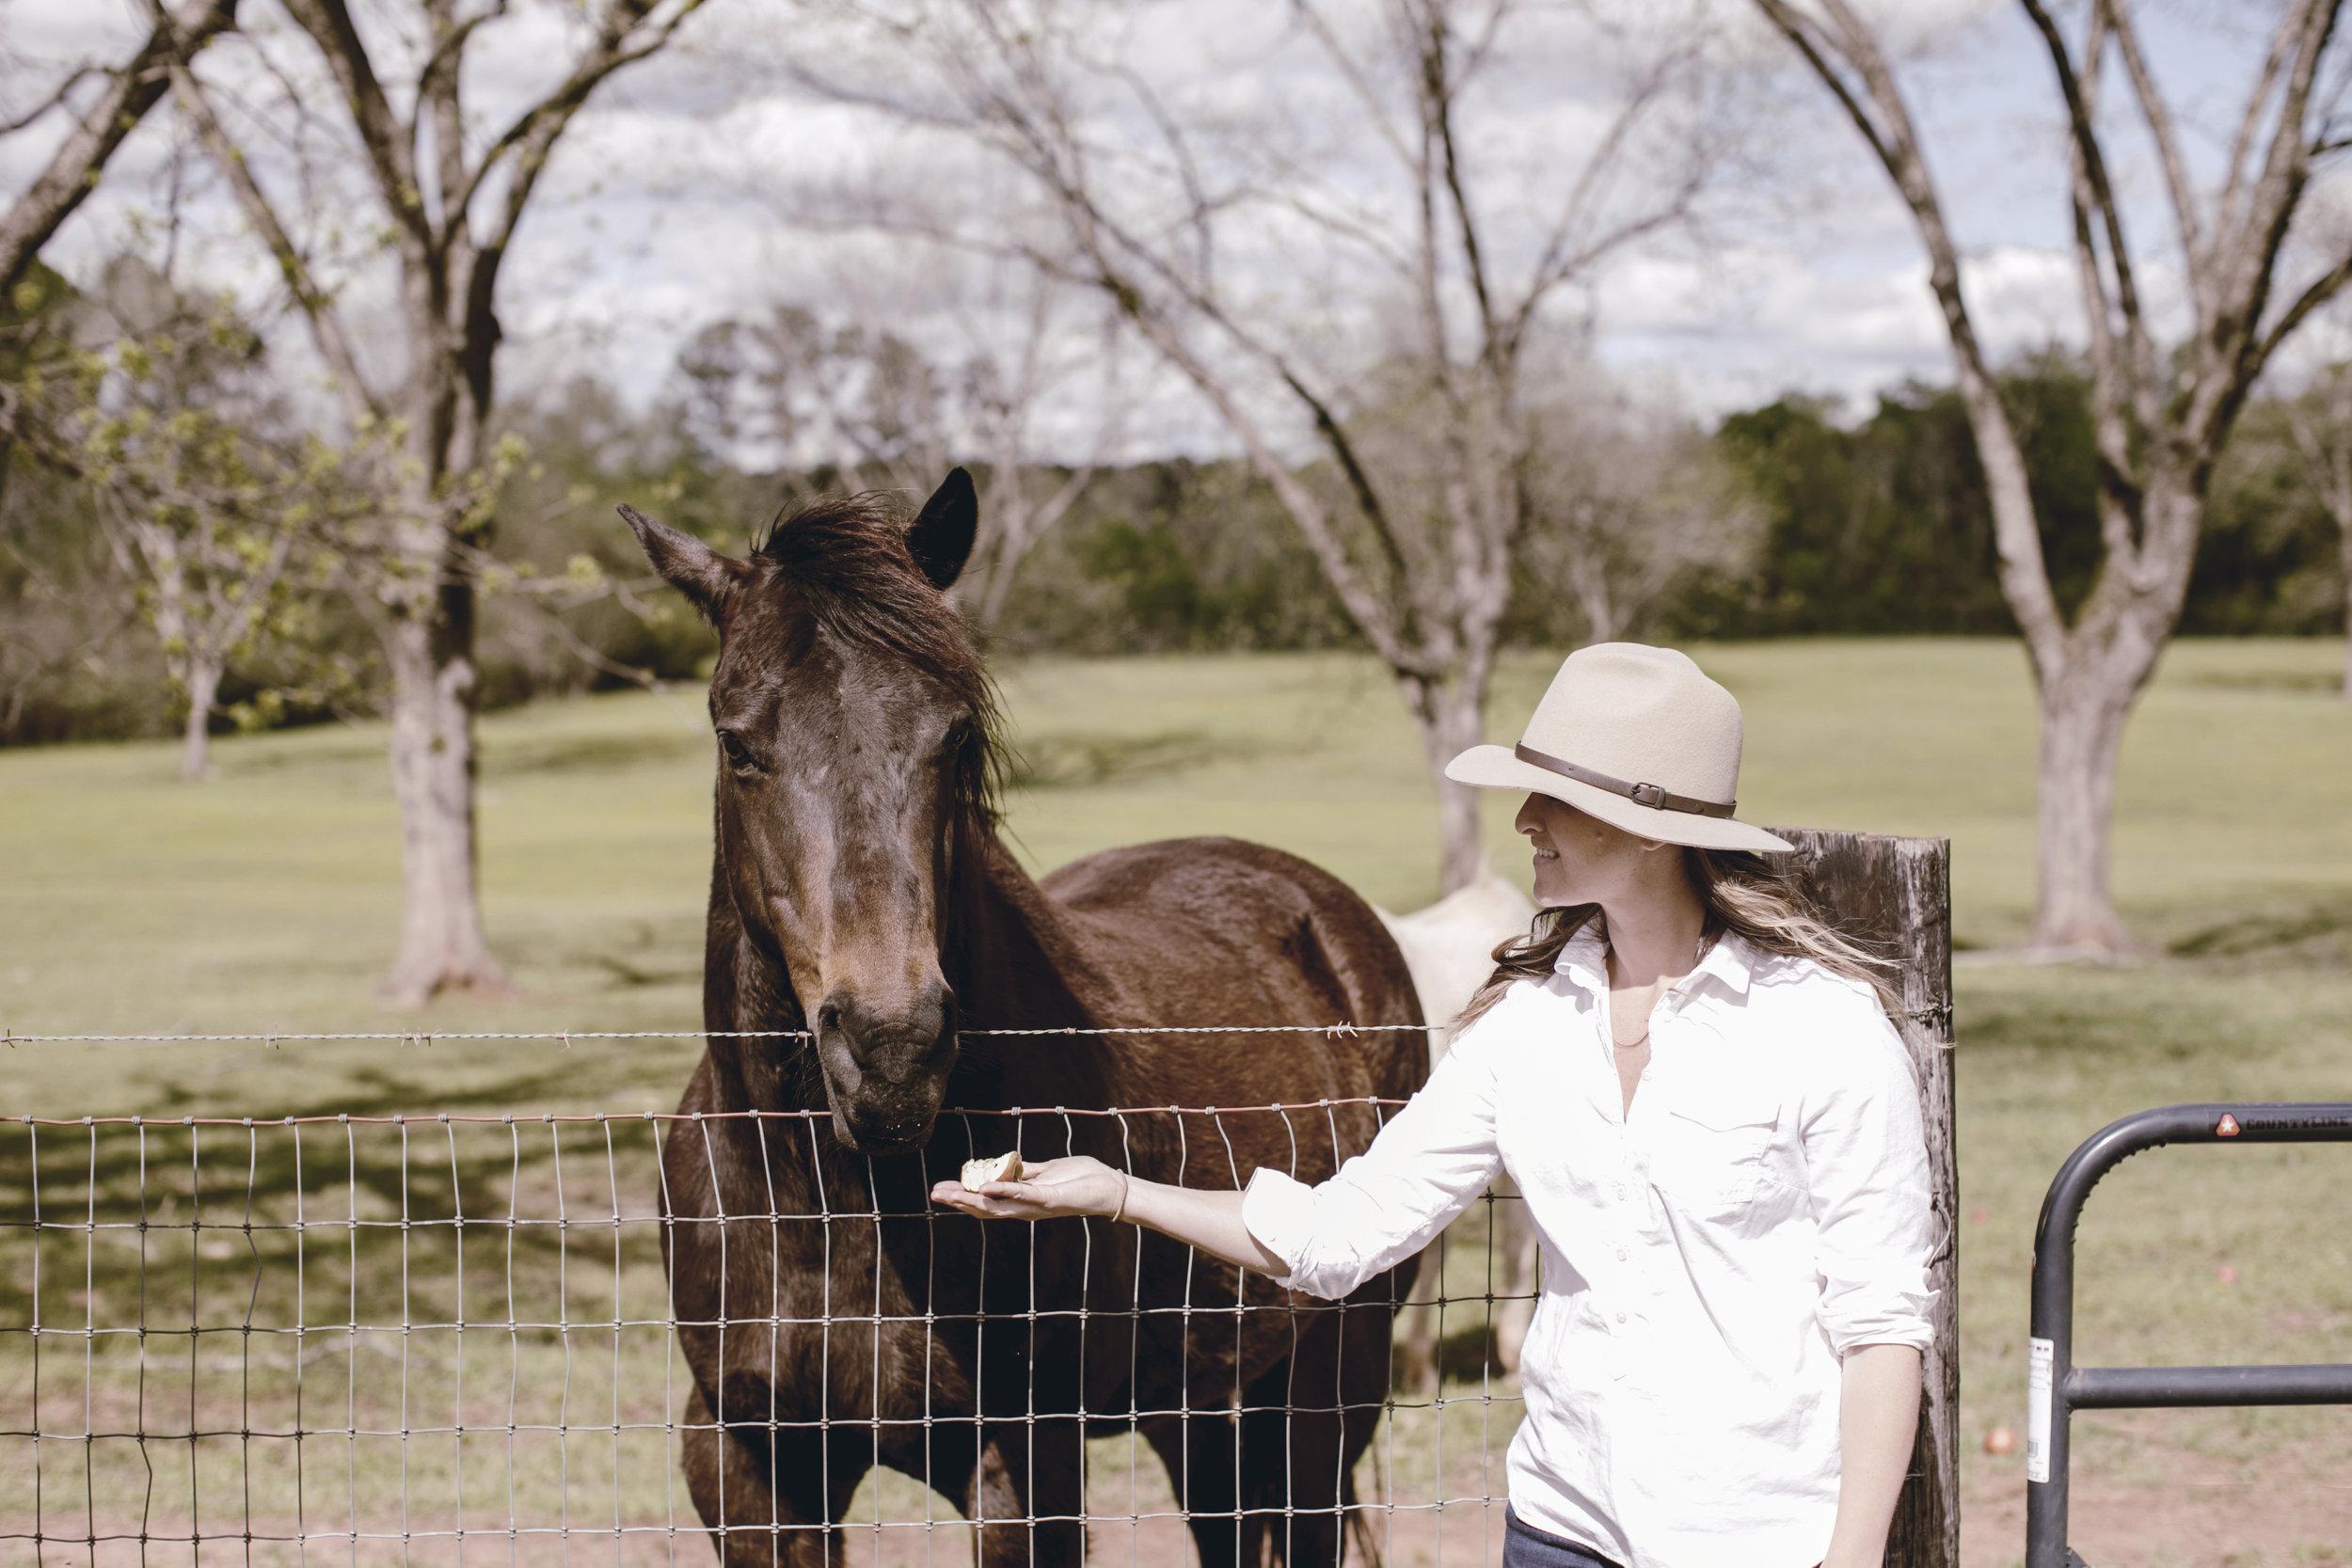 black horse at the farm / heirloomed